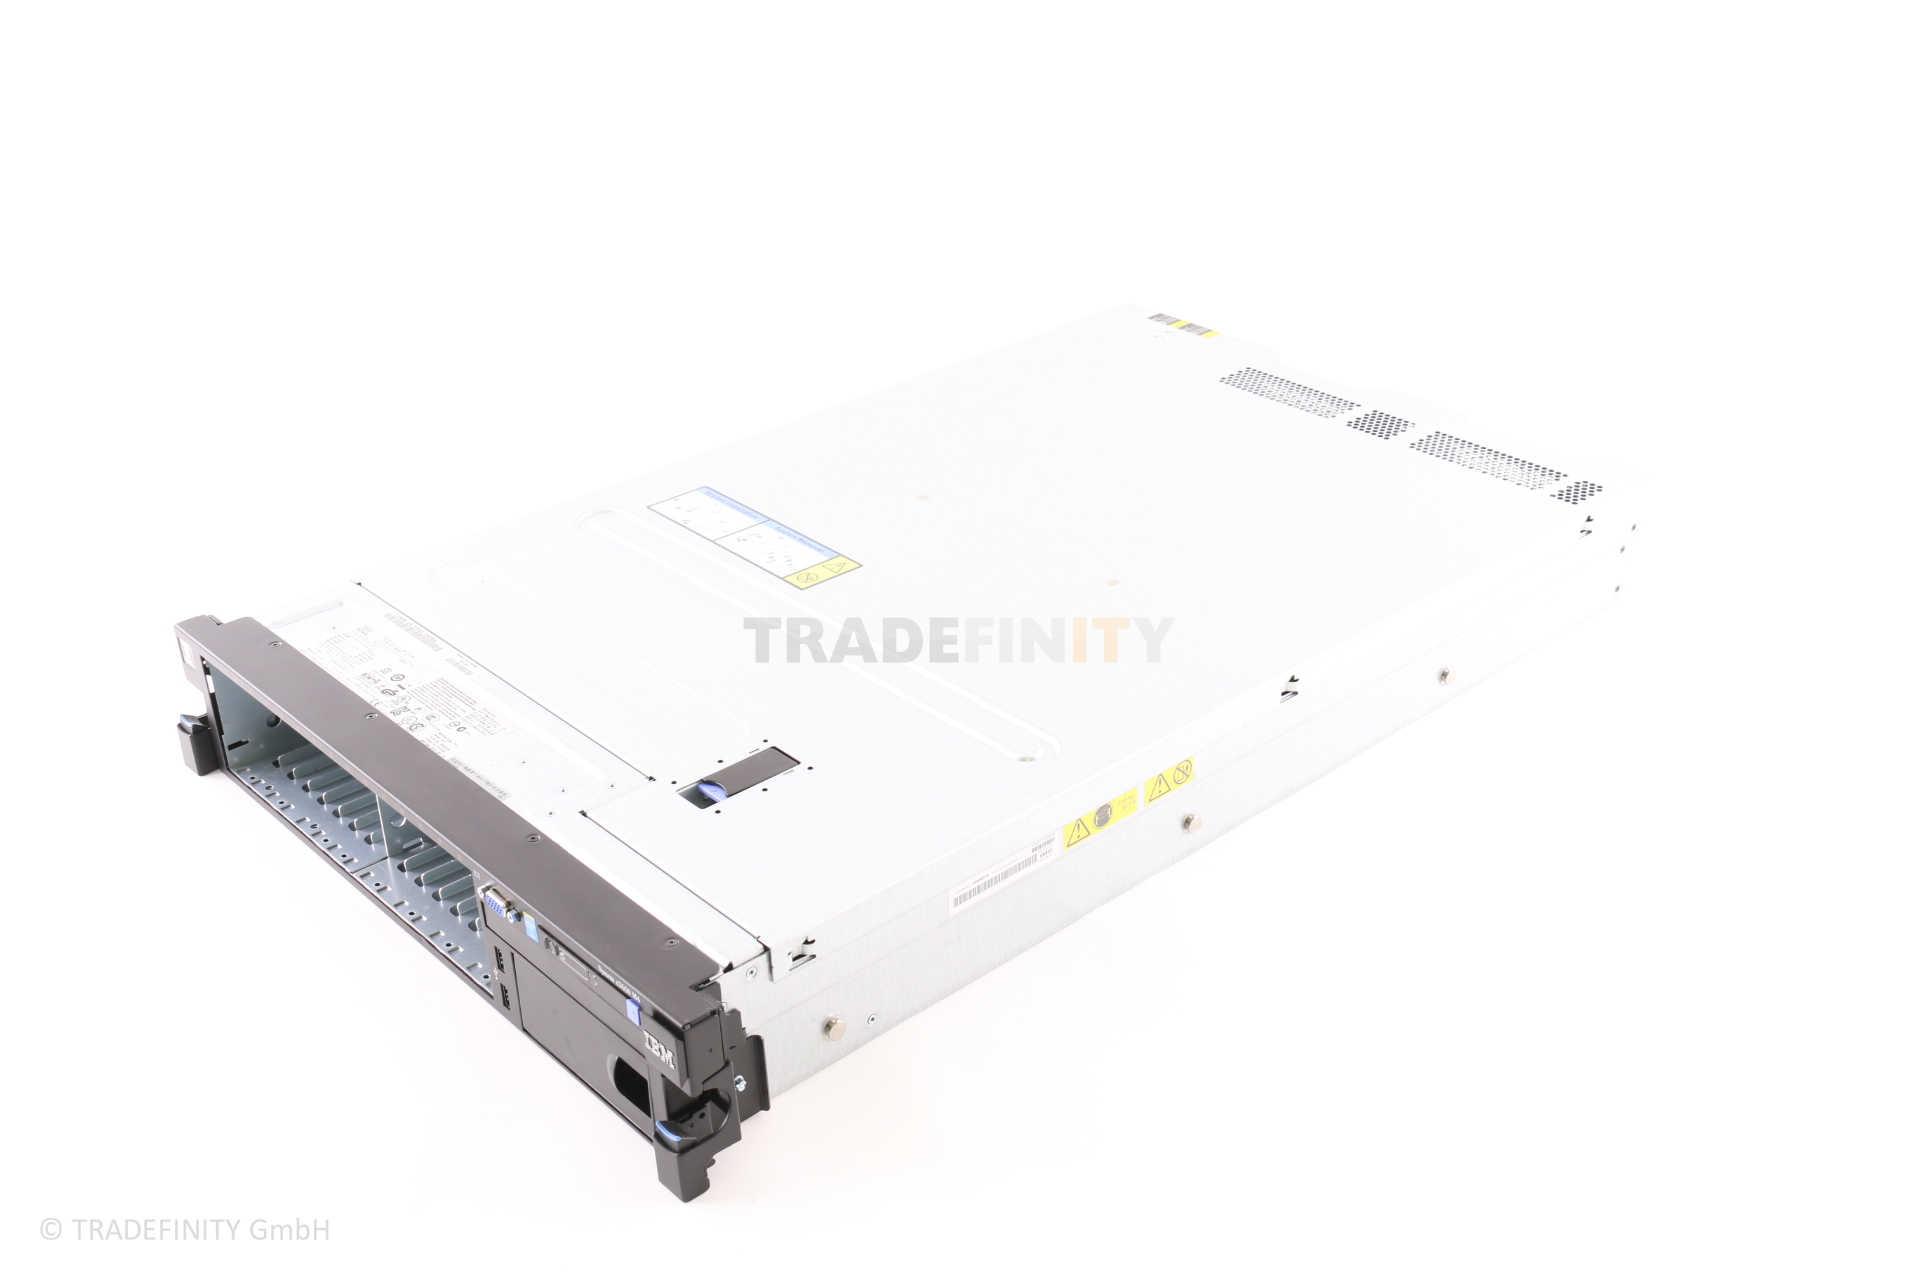 X3650 M4 Server